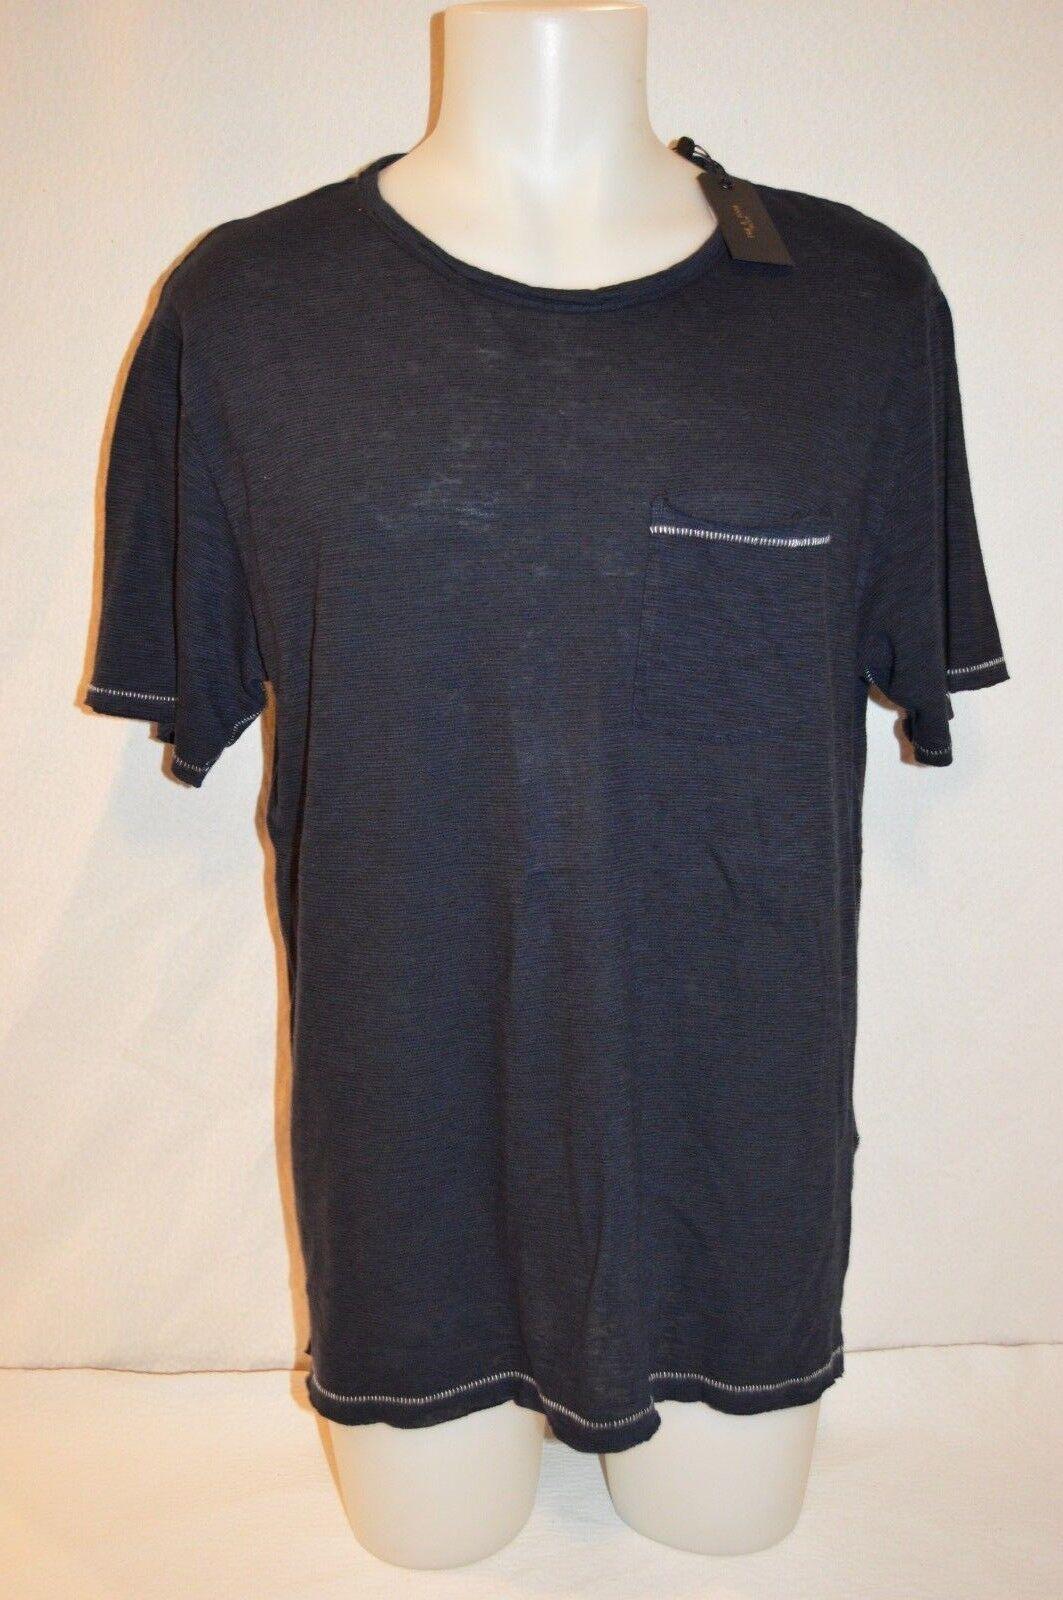 RAG & BONE Man's LINEN Crew Neck OWEN T-shirt  NEW  Größe X-Large Retail  135